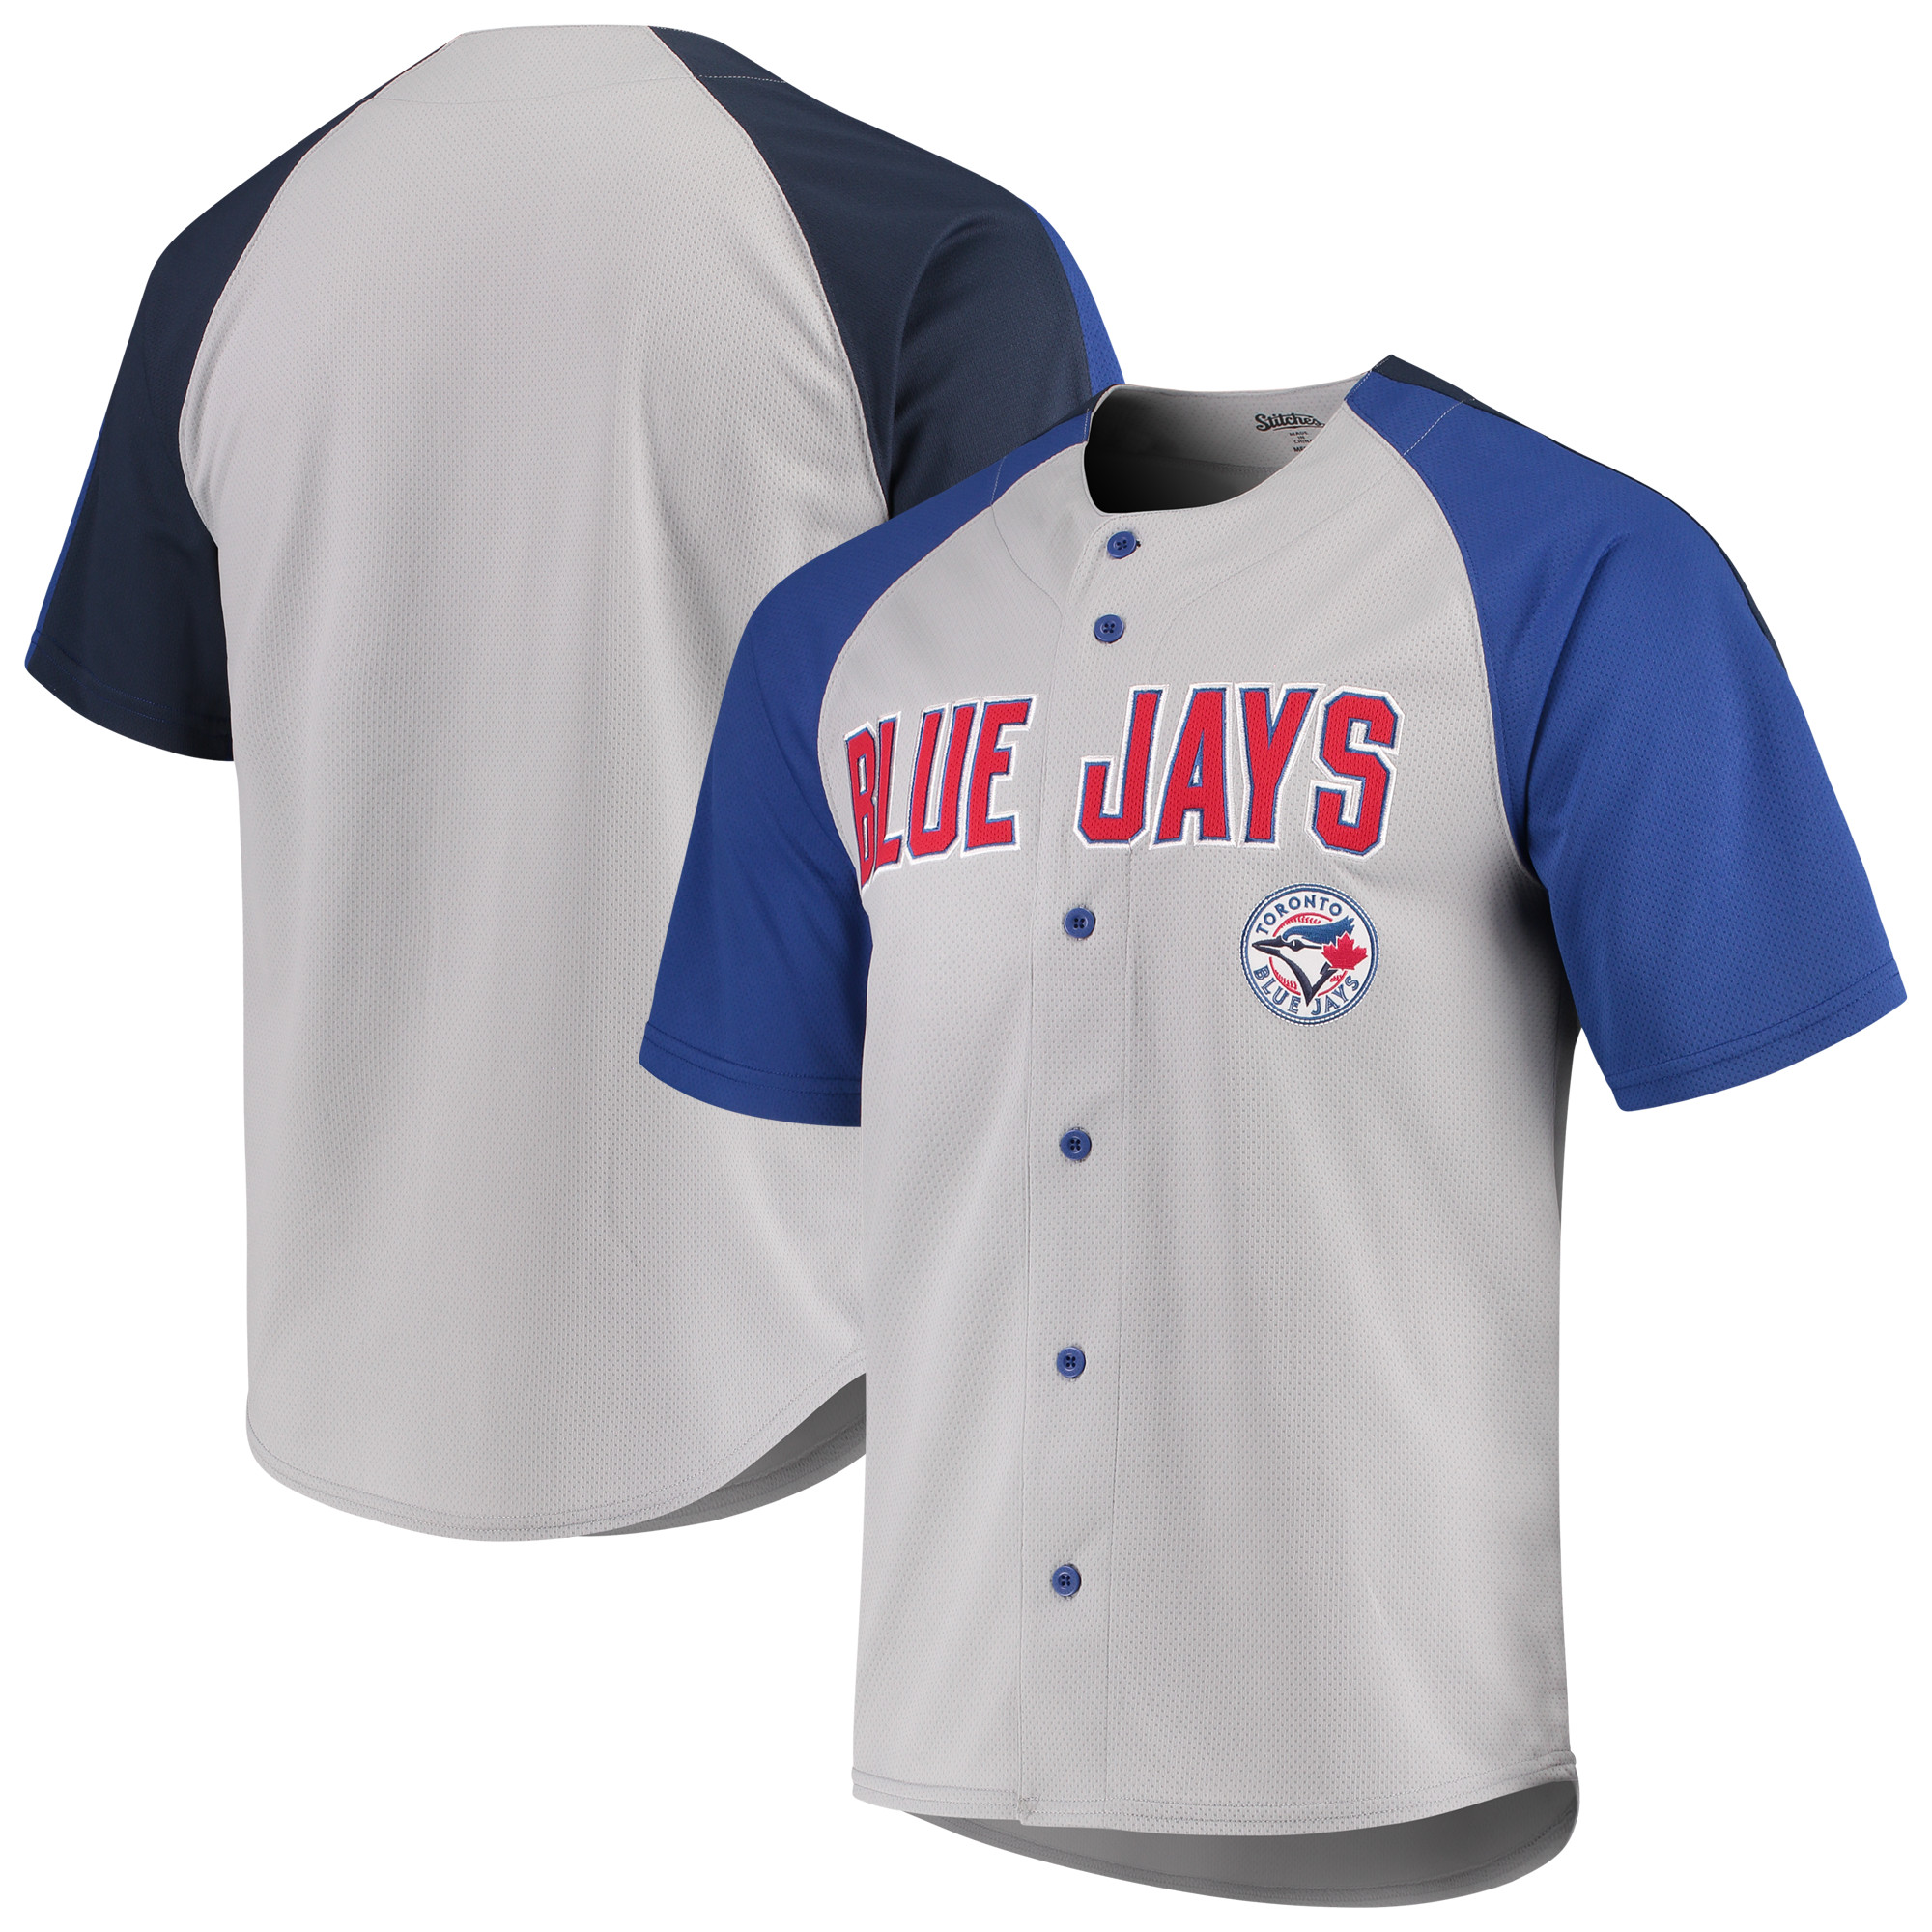 Toronto Blue Jays Stitches Lightweight Mesh Jersey - Gray/Navy